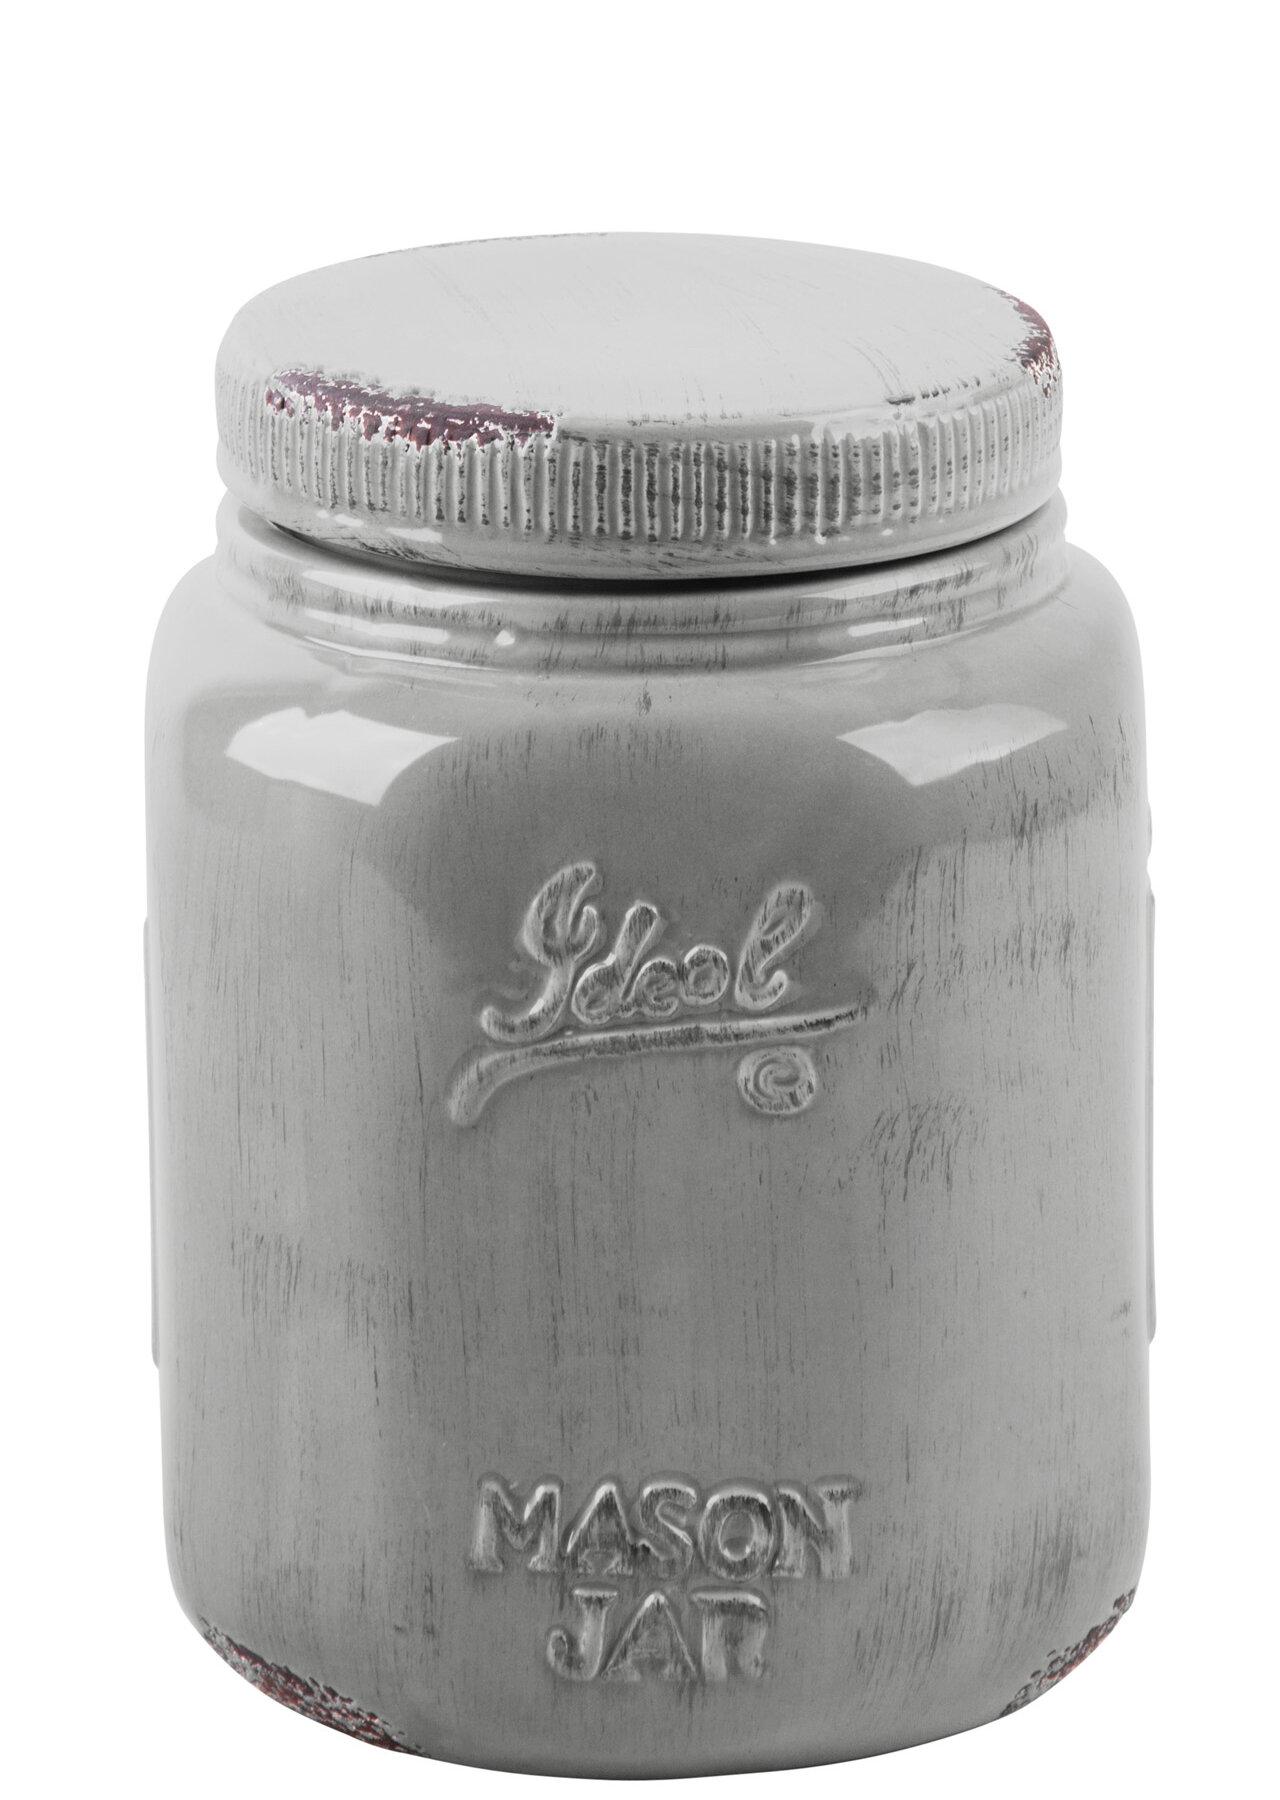 Sand Stable Mason Jar 2 Qt Kitchen Canister Reviews Wayfair